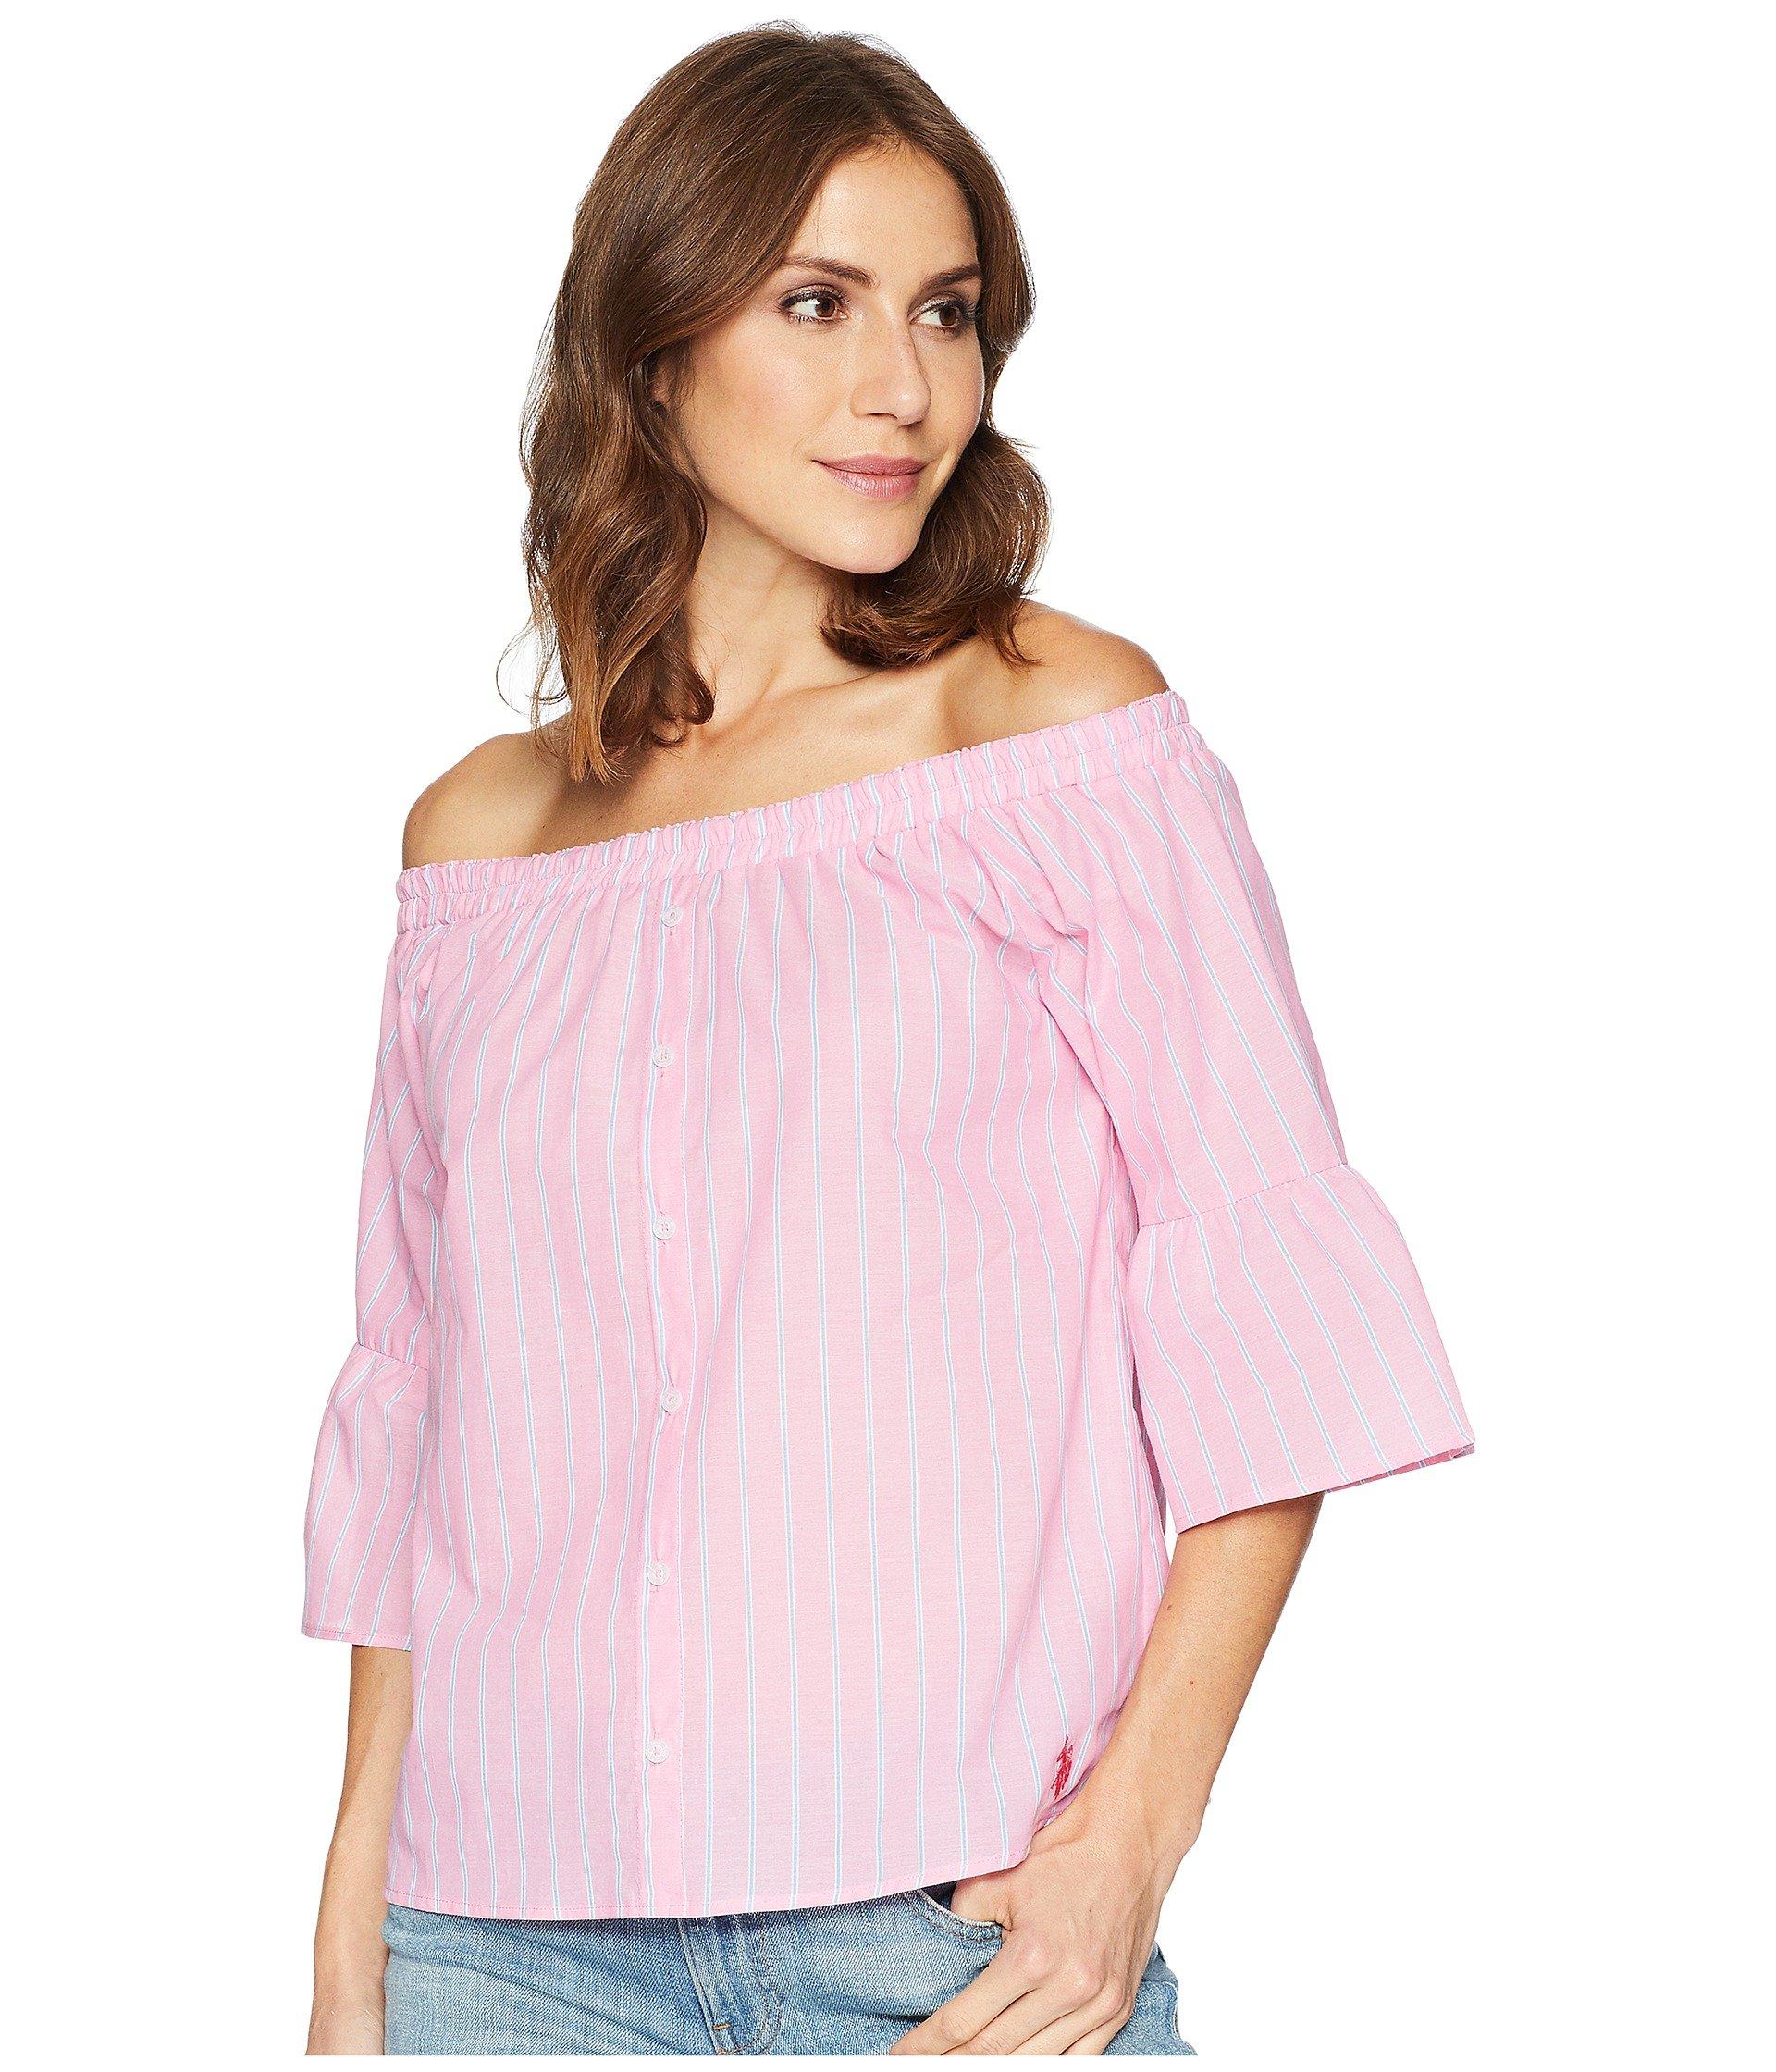 Blusa para Mujer U.S. POLO ASSN. Off Shoulder Striped Shirt  + U.S. POLO ASSN. en VeoyCompro.net